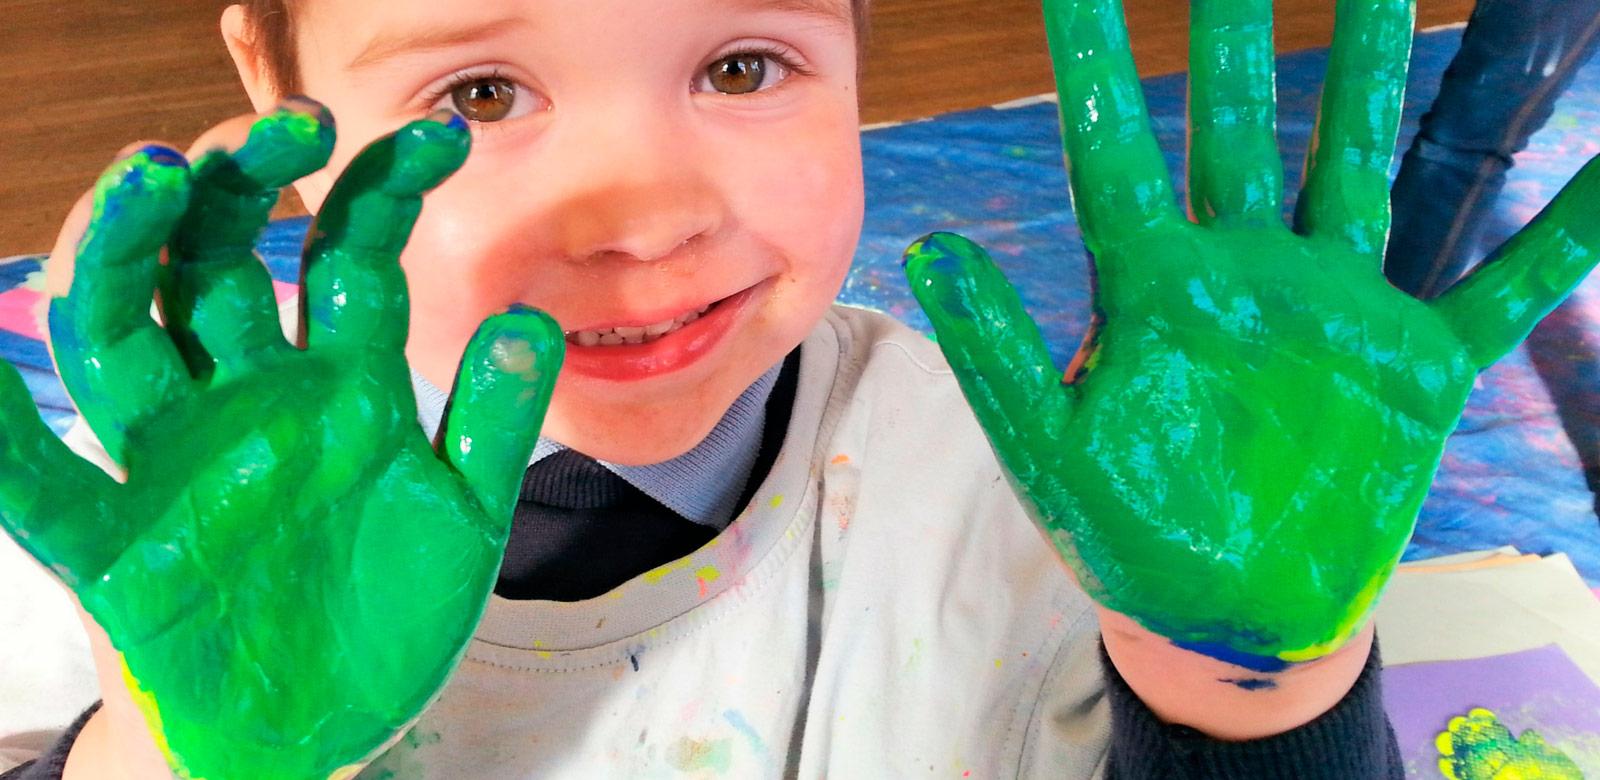 Cake Art Penrith Classes : Home - Artventurers Carlisle, Penrith & Keswick